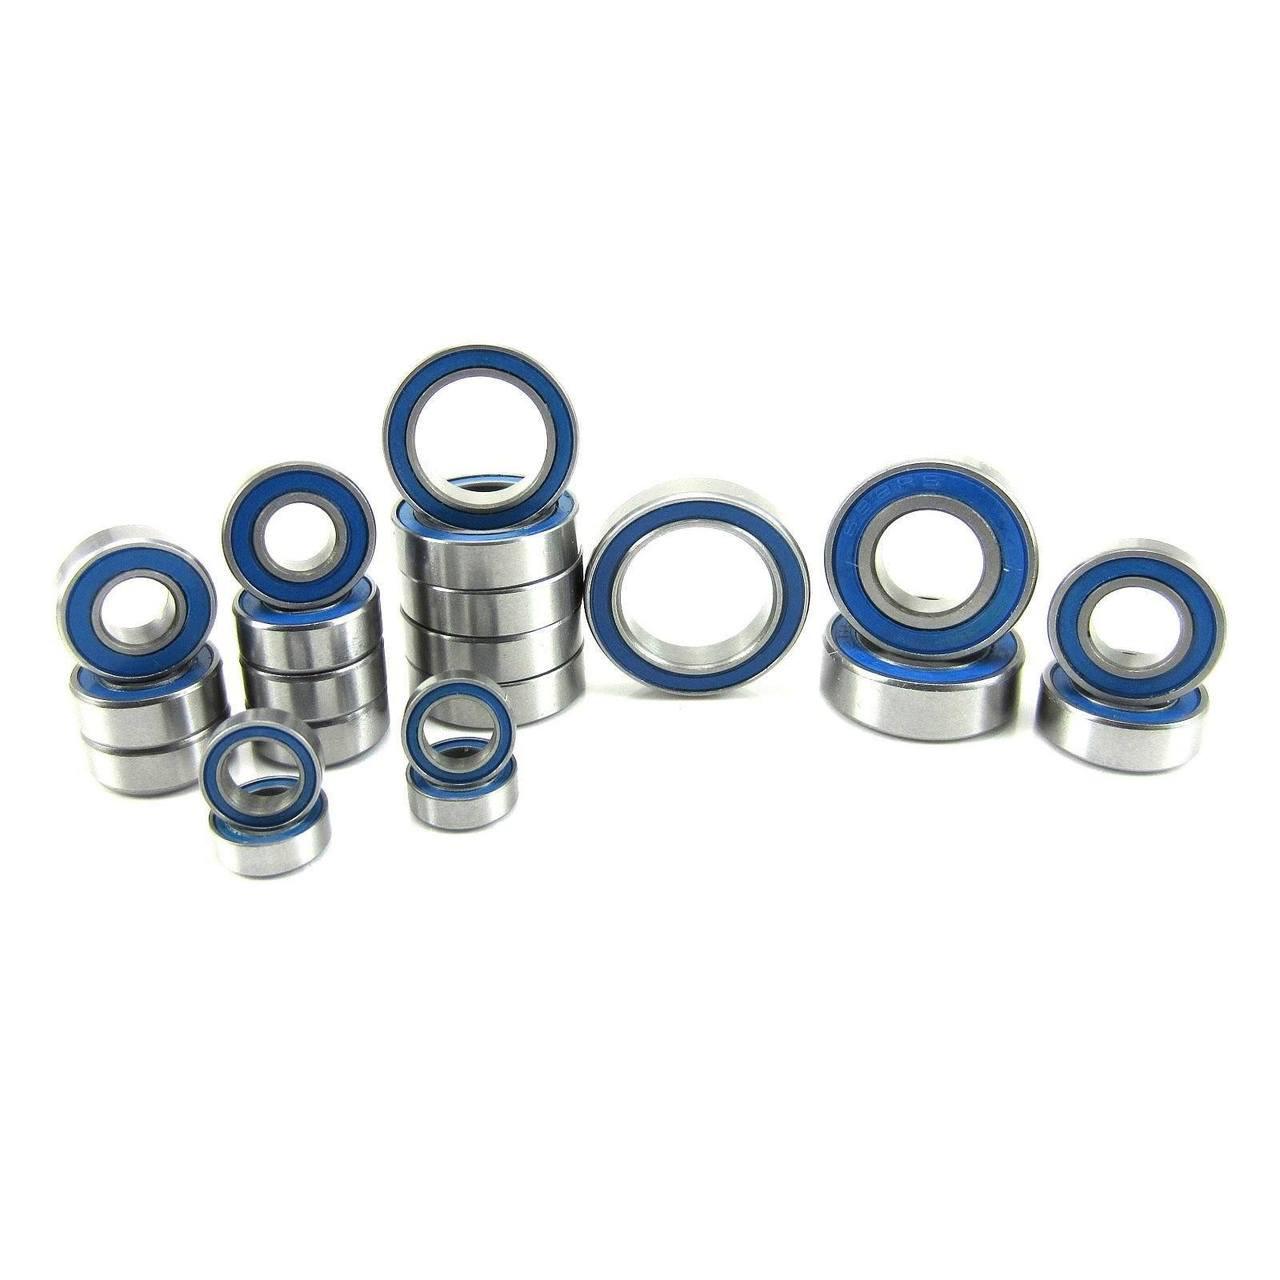 TRB RC Precision Ball Bearing Kit BLU (21) Rubber Sealed Traxxas Slash 4x4 VXL